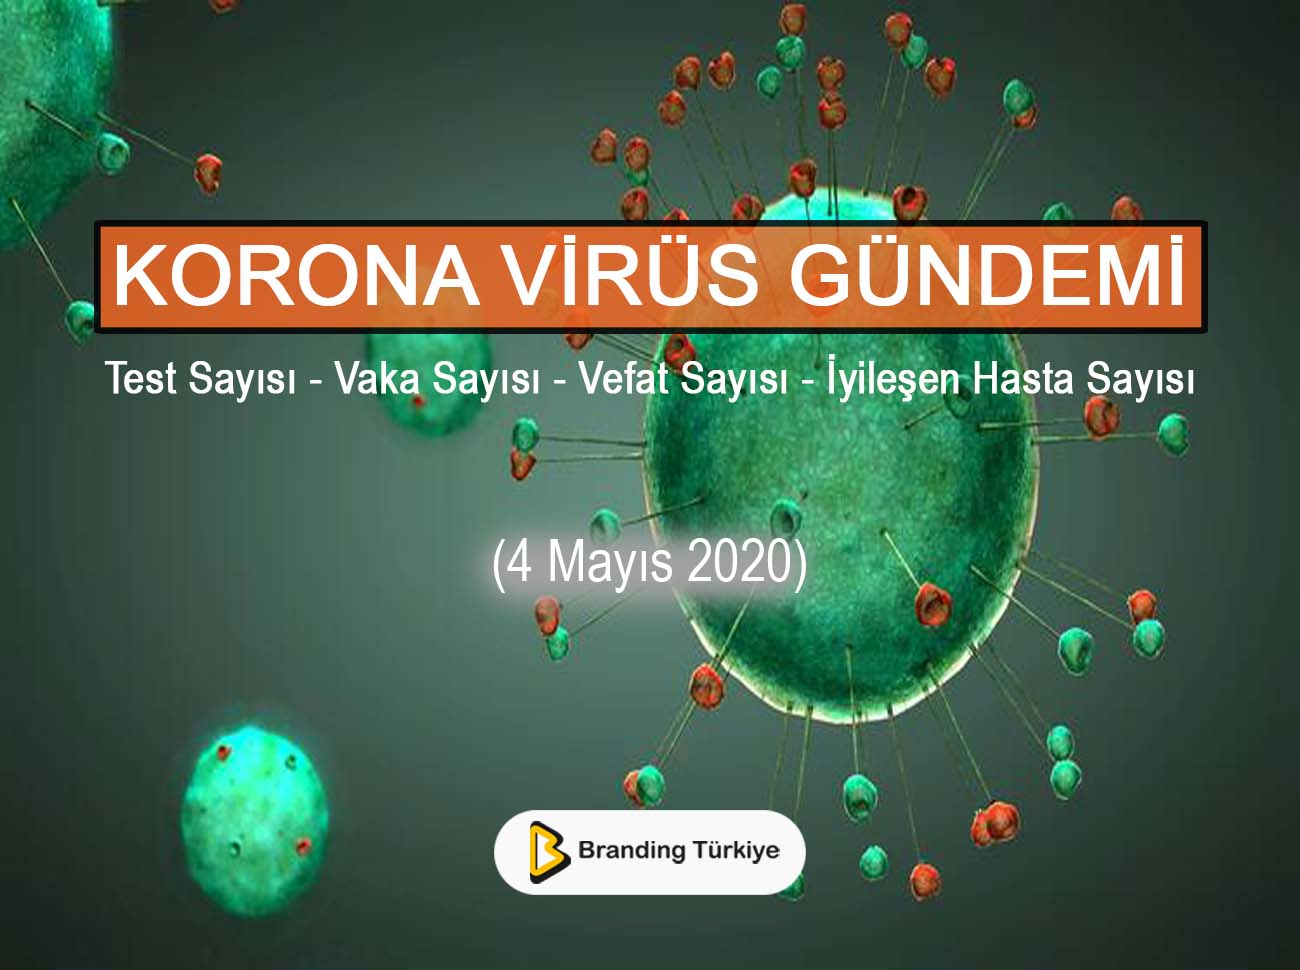 Korona Virüs Gündemi (4 Mayıs 2020)